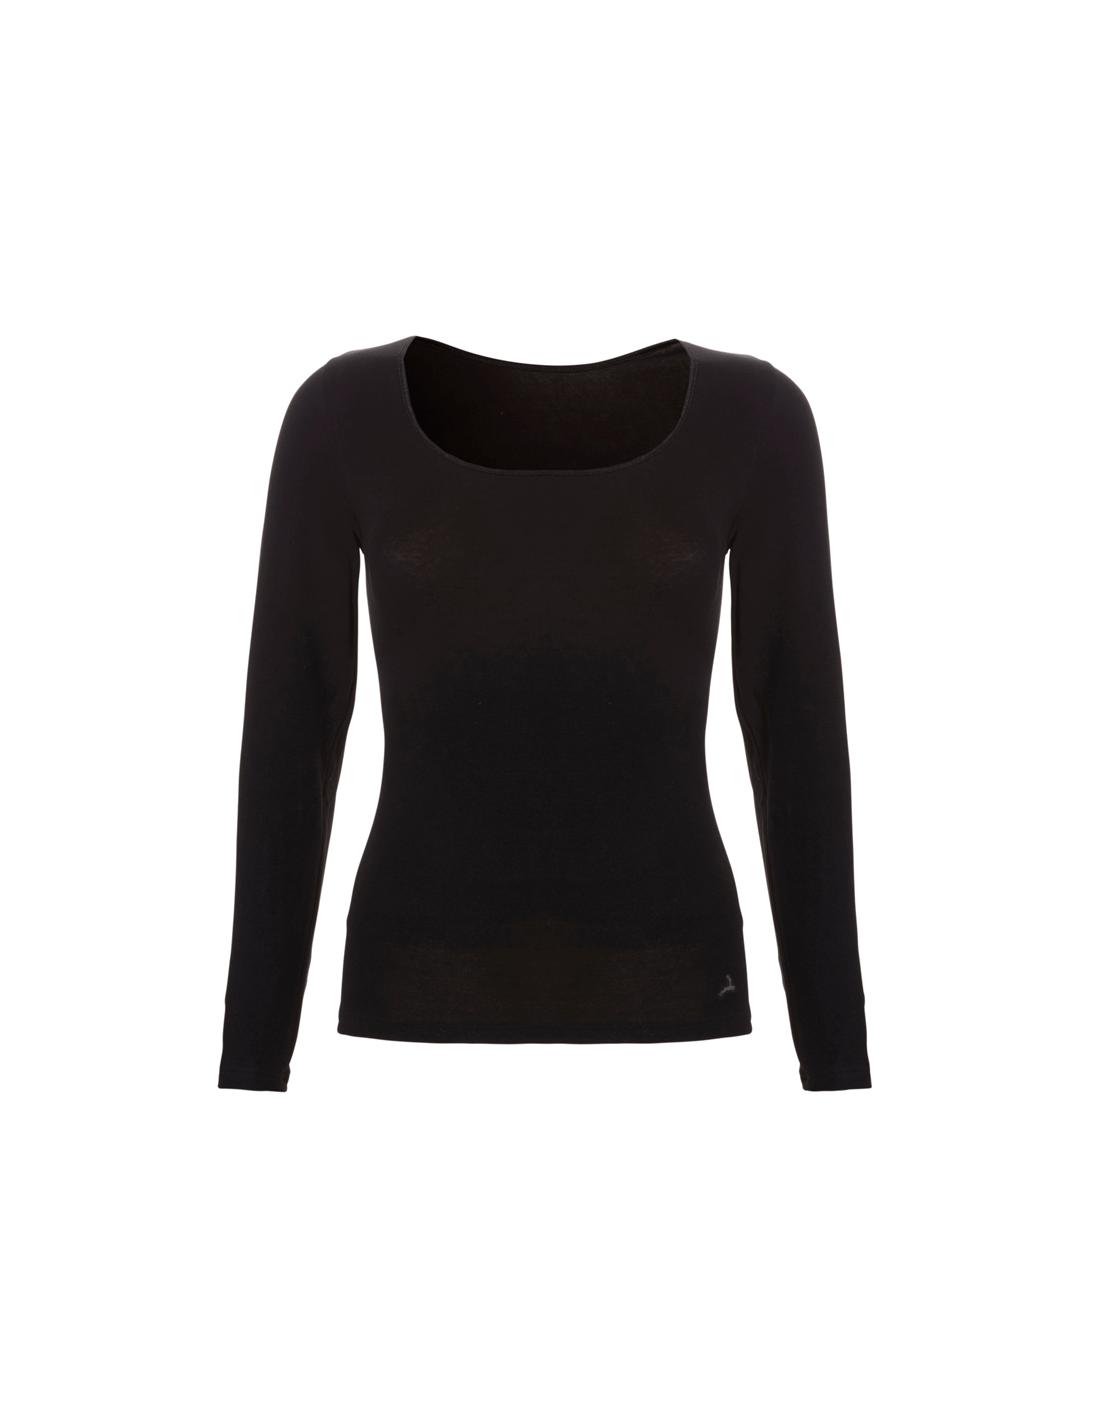 fa708e121df Ten Cate Dames Shirt Longsleeve Zwart